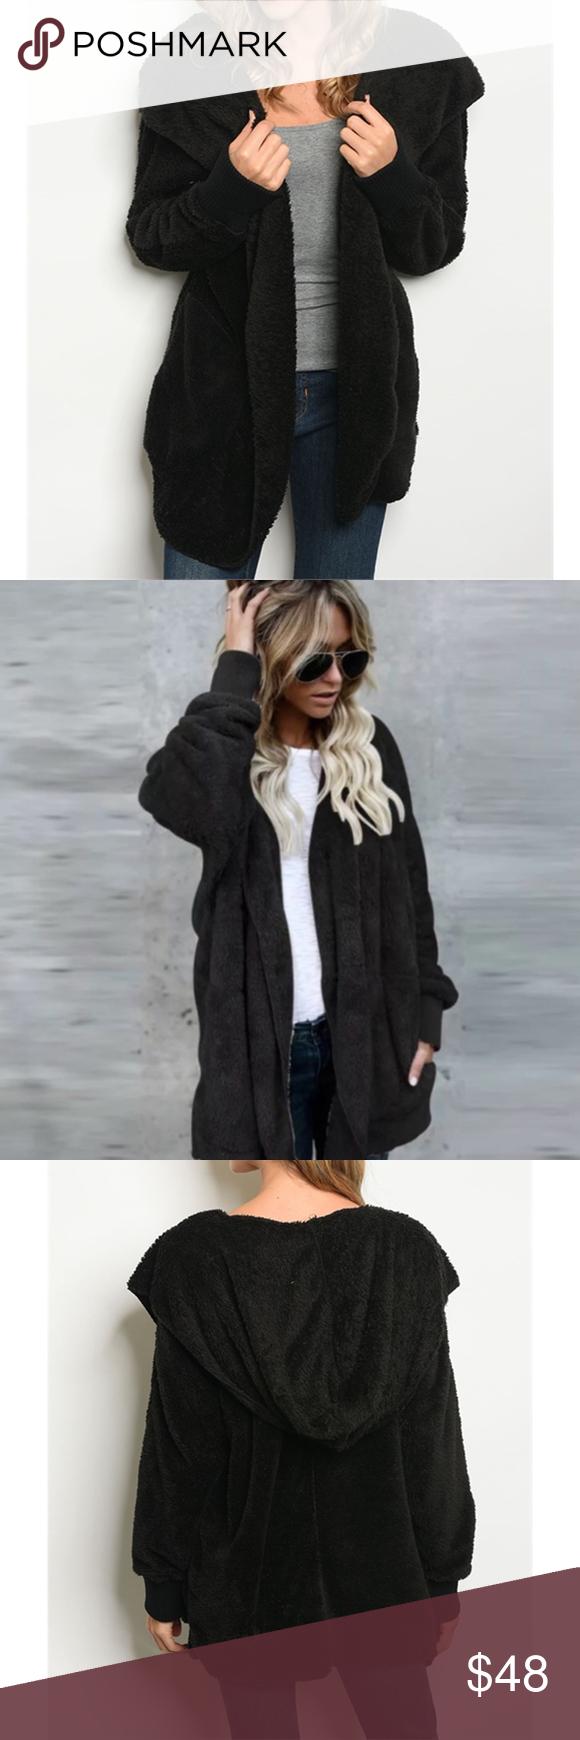 Super Soft Black Sherpa Jacket Long sleeve open front